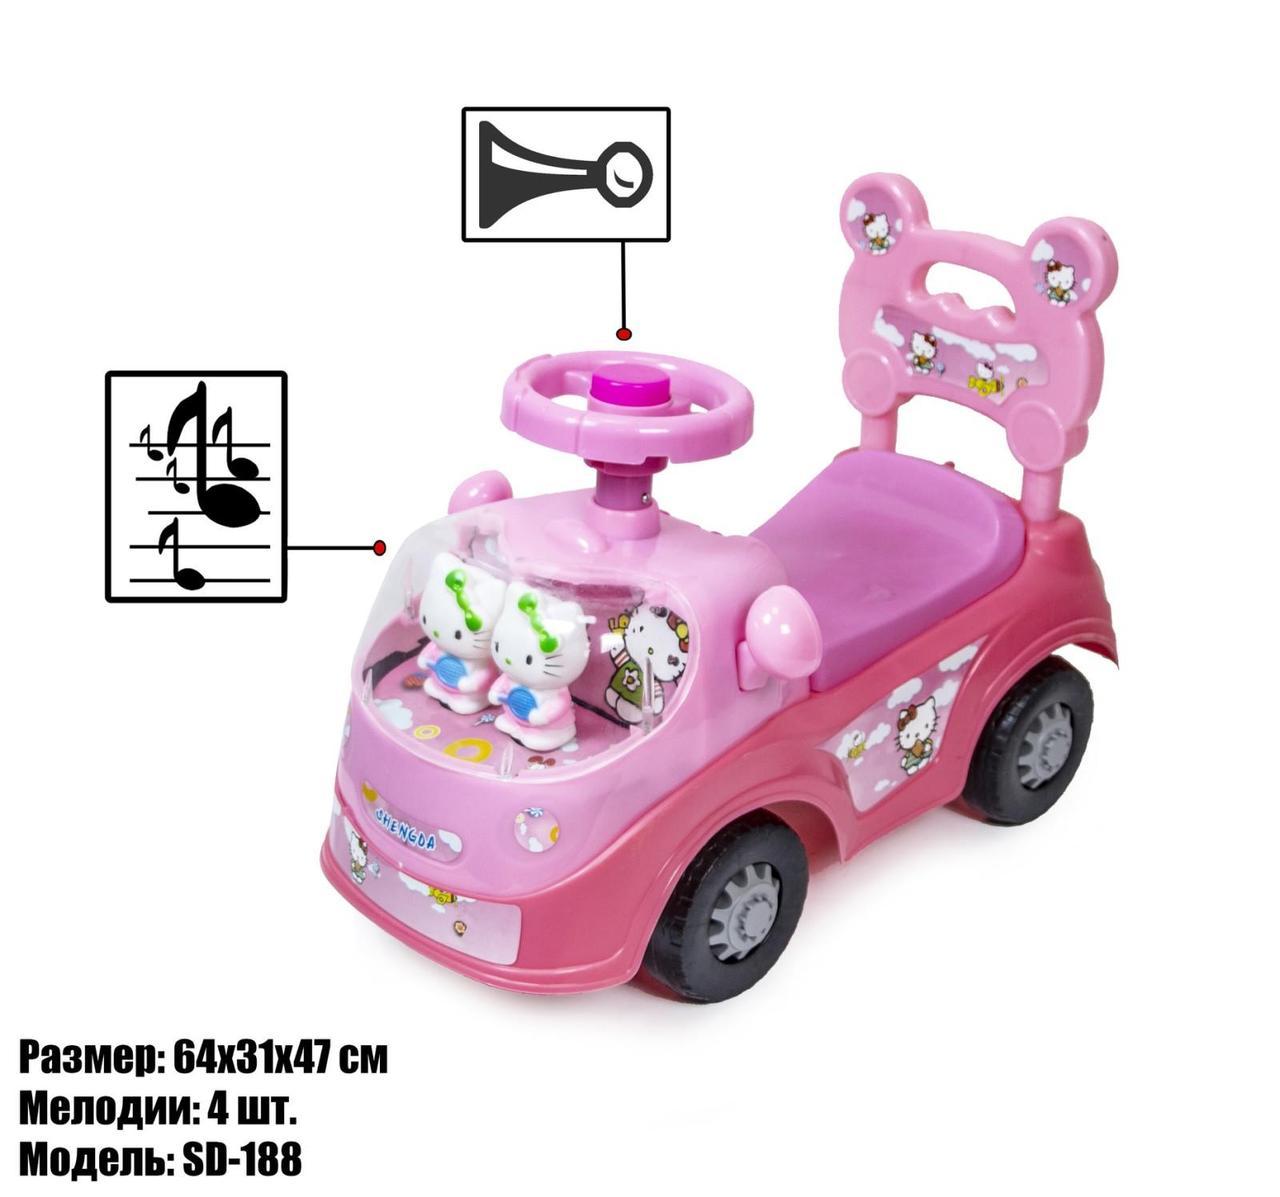 Машинка каталка толокар Hello Kitty 112 пастельно-розовый